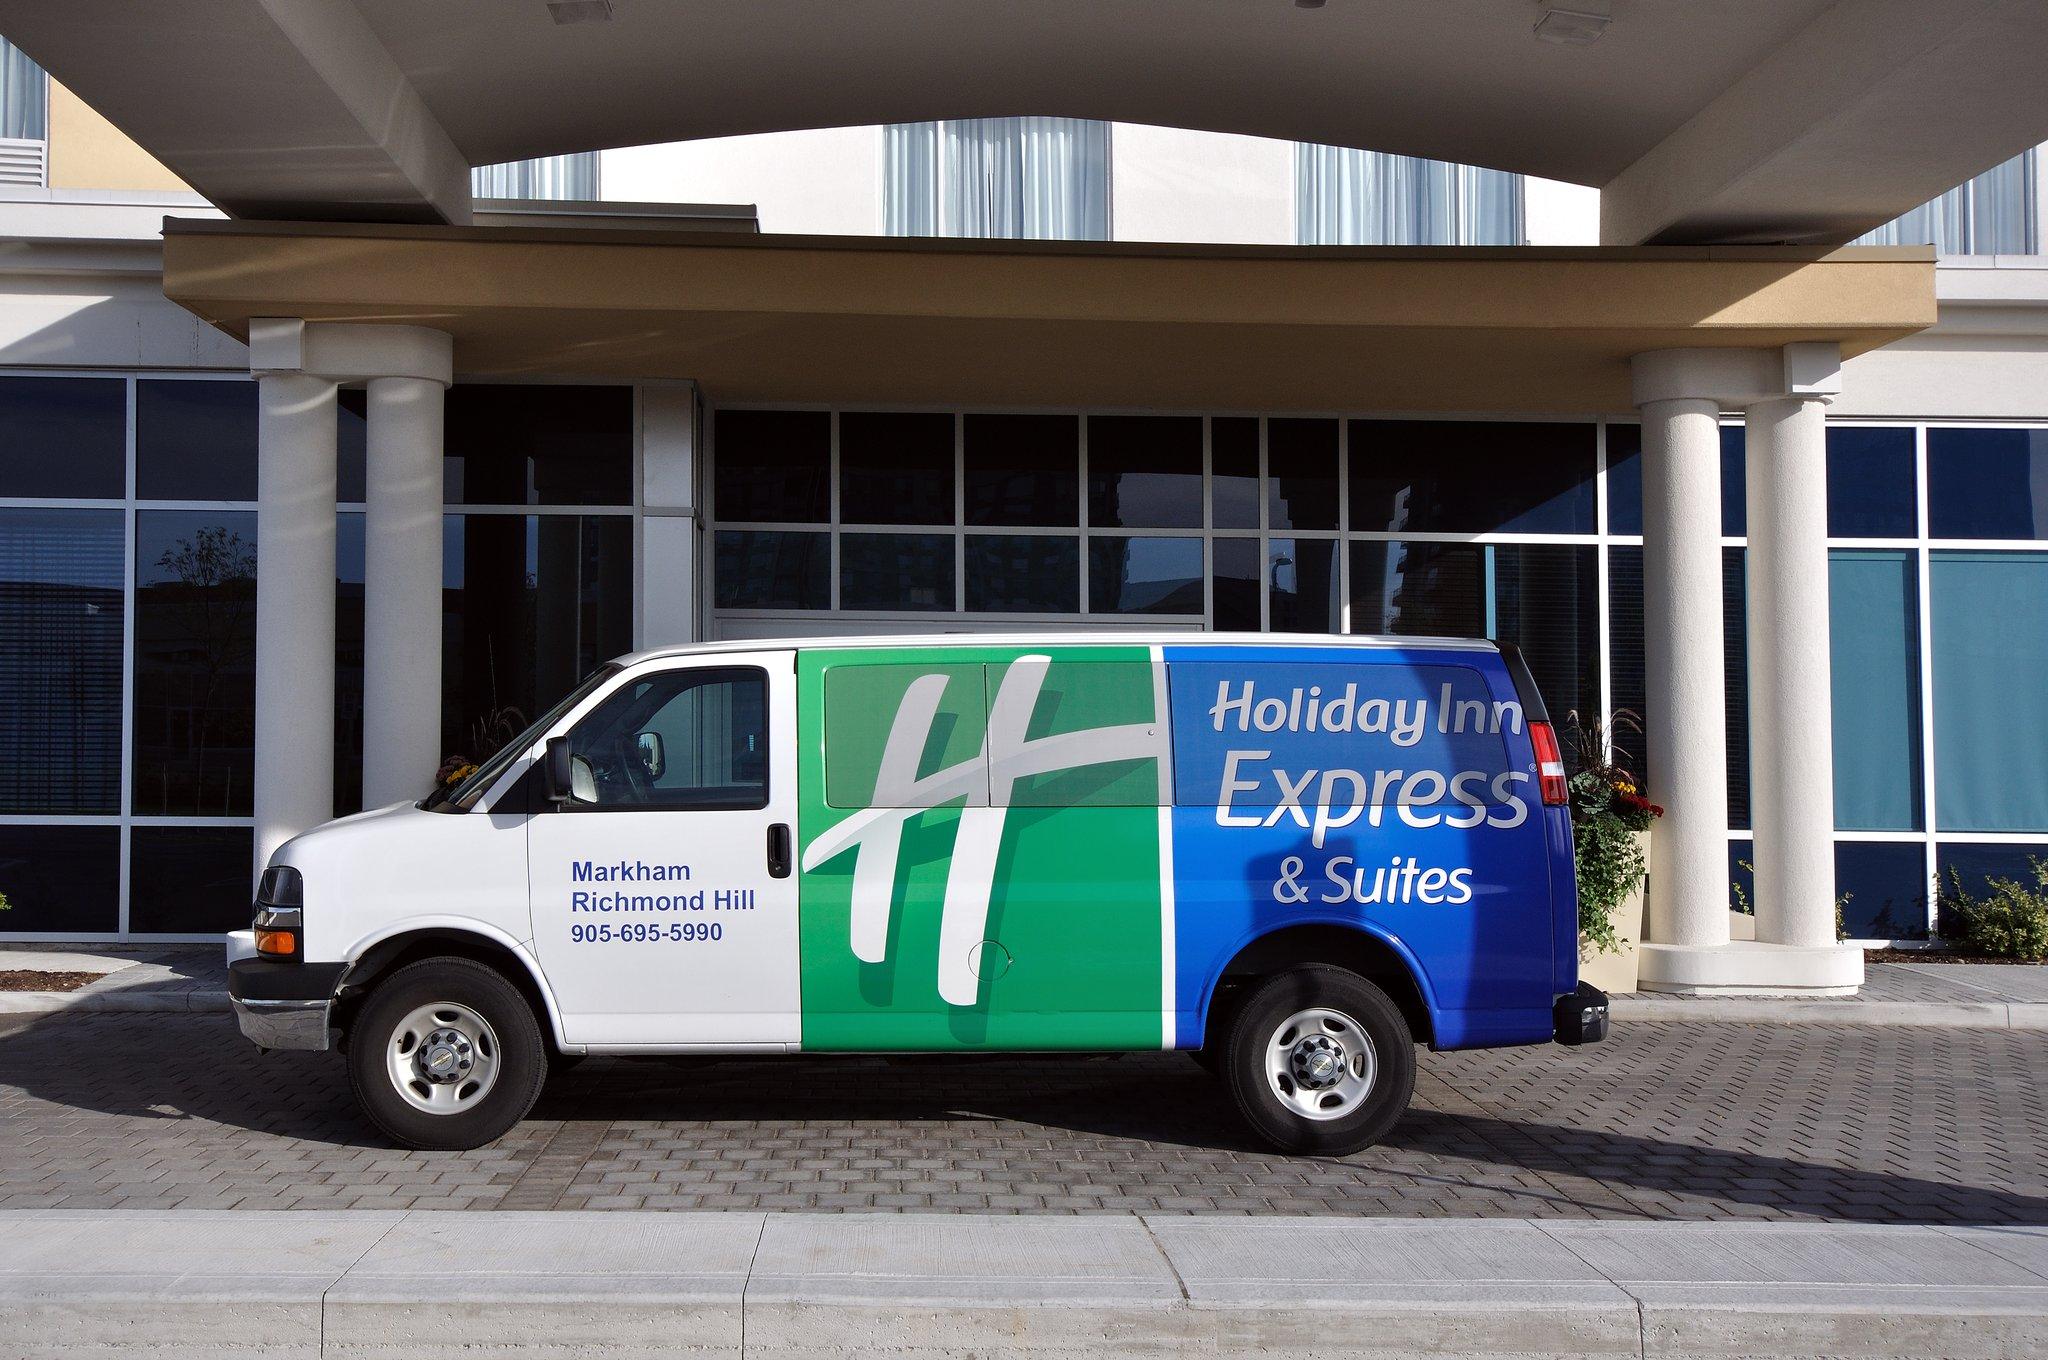 Holiday Inn Express & Suites TORONTO - MARKHAM